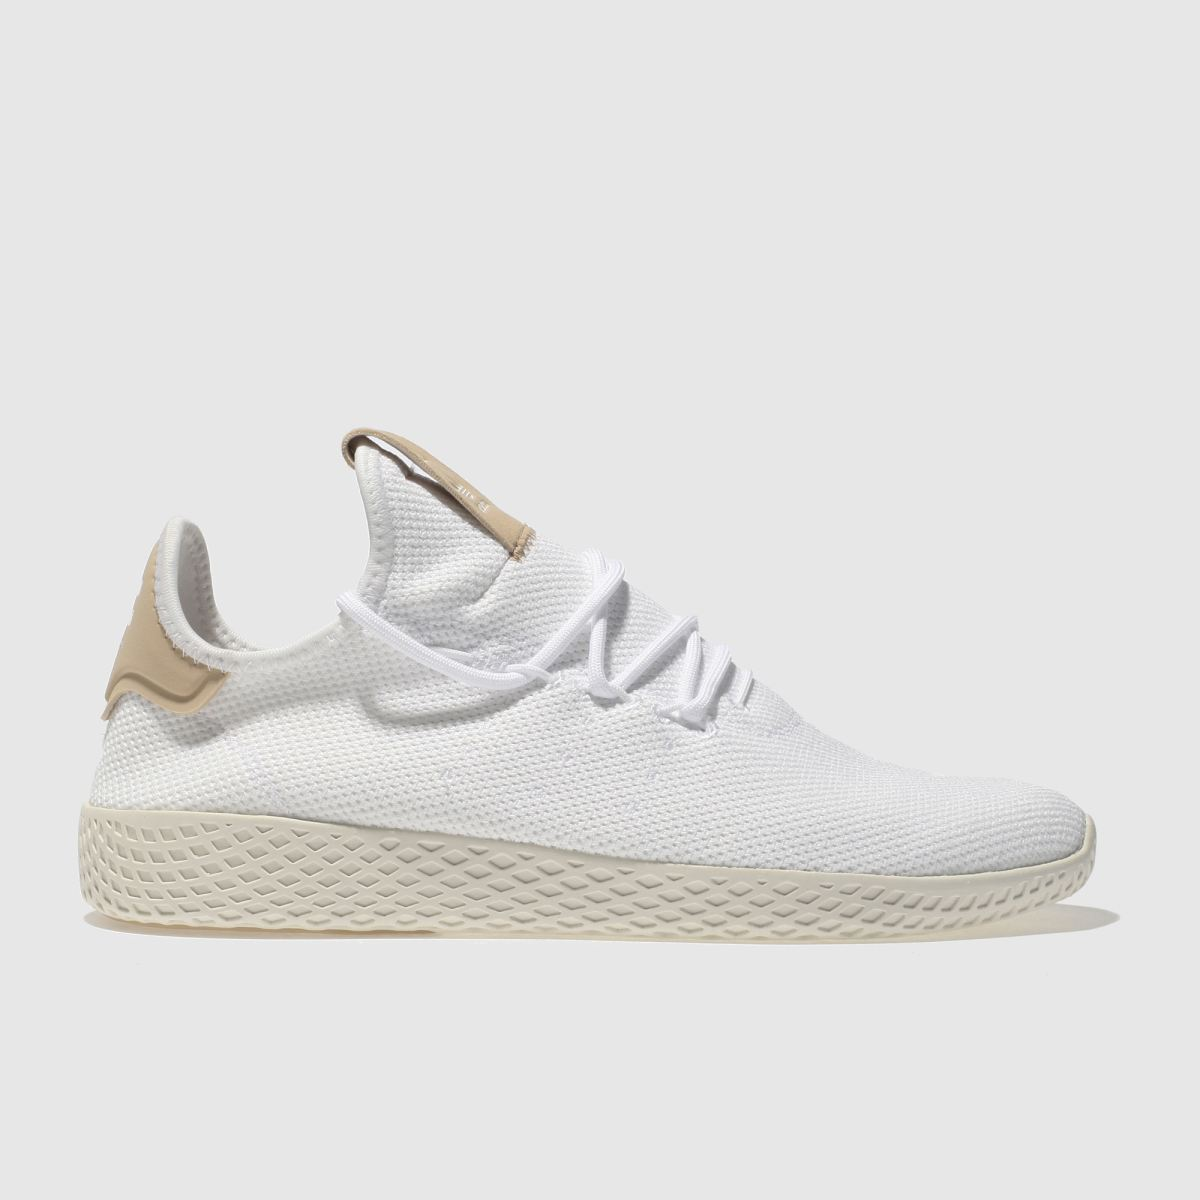 Adidas White Pharrell Williams Tennis Hu Trainers